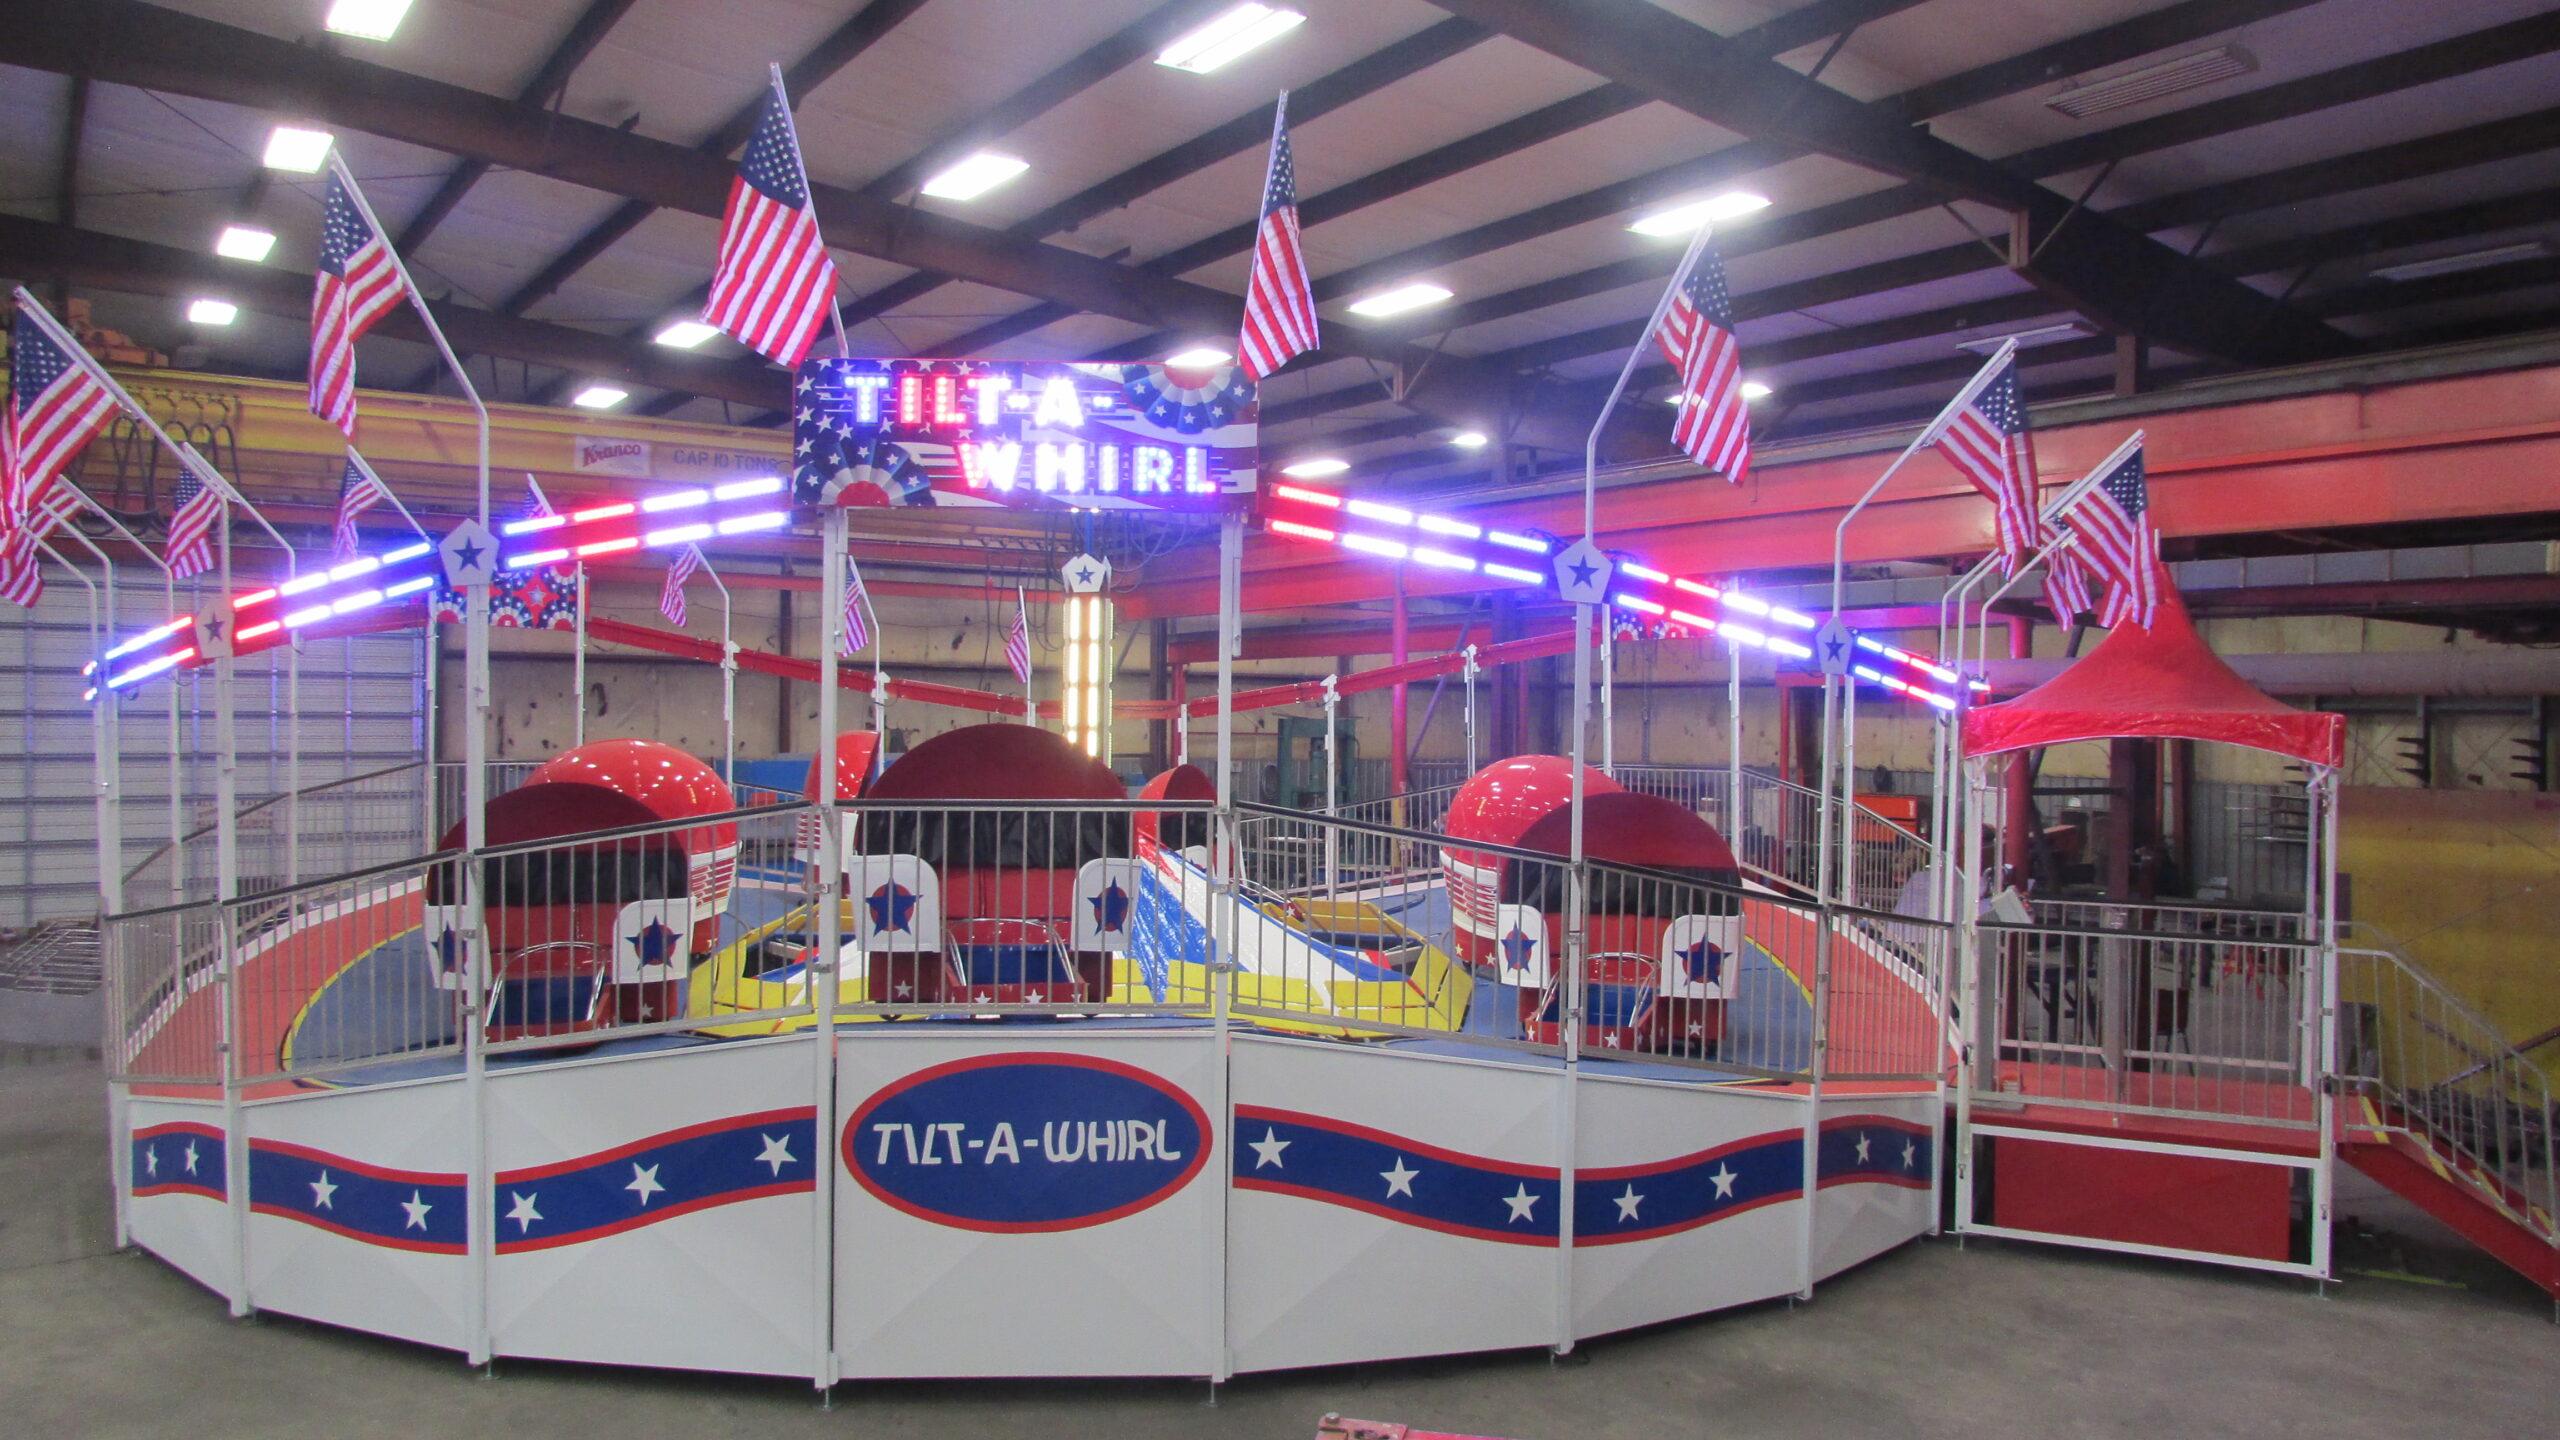 Larson International Fair Themed Tilt-A-Whirl